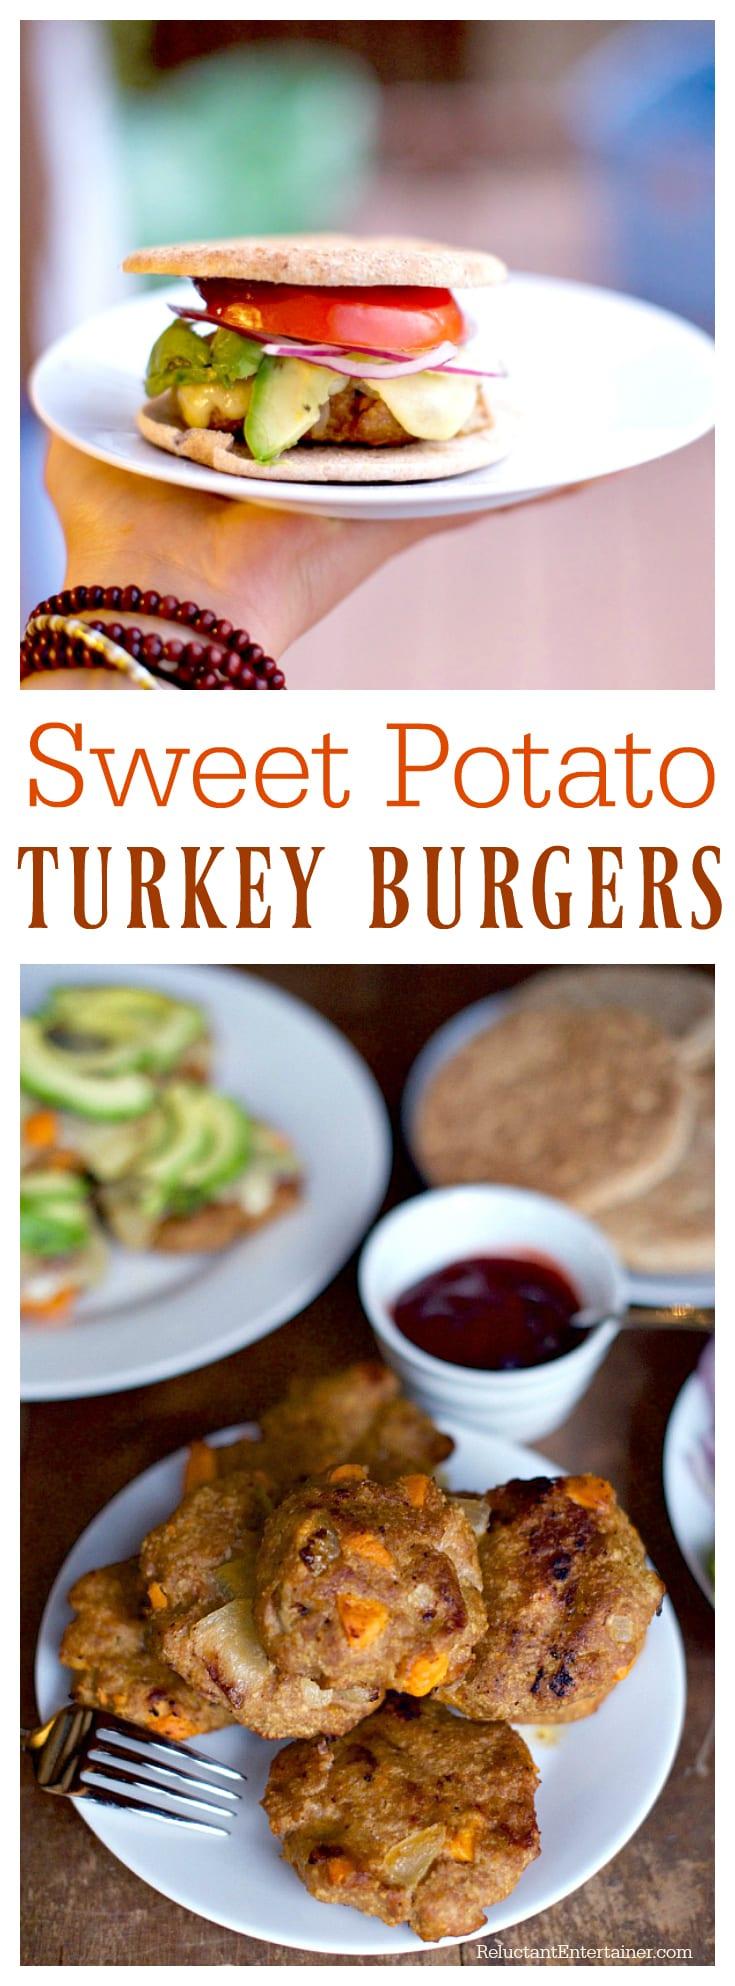 Sweet Potato Turkey Burgers at ReluctantEntertainer.com